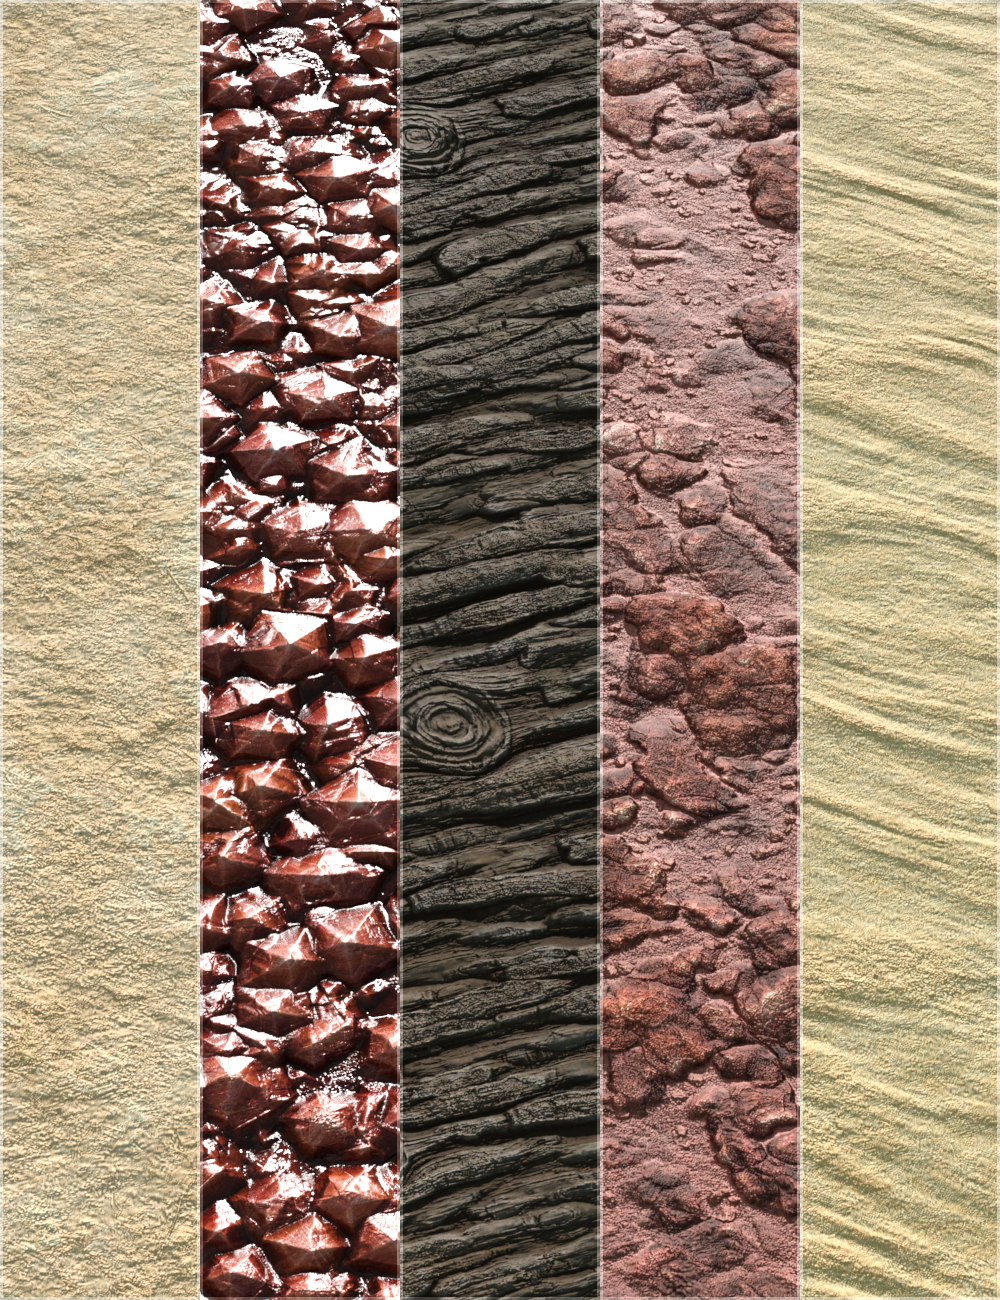 Desert Tribe Textures - Merchant Resource by: vikike176, 3D Models by Daz 3D